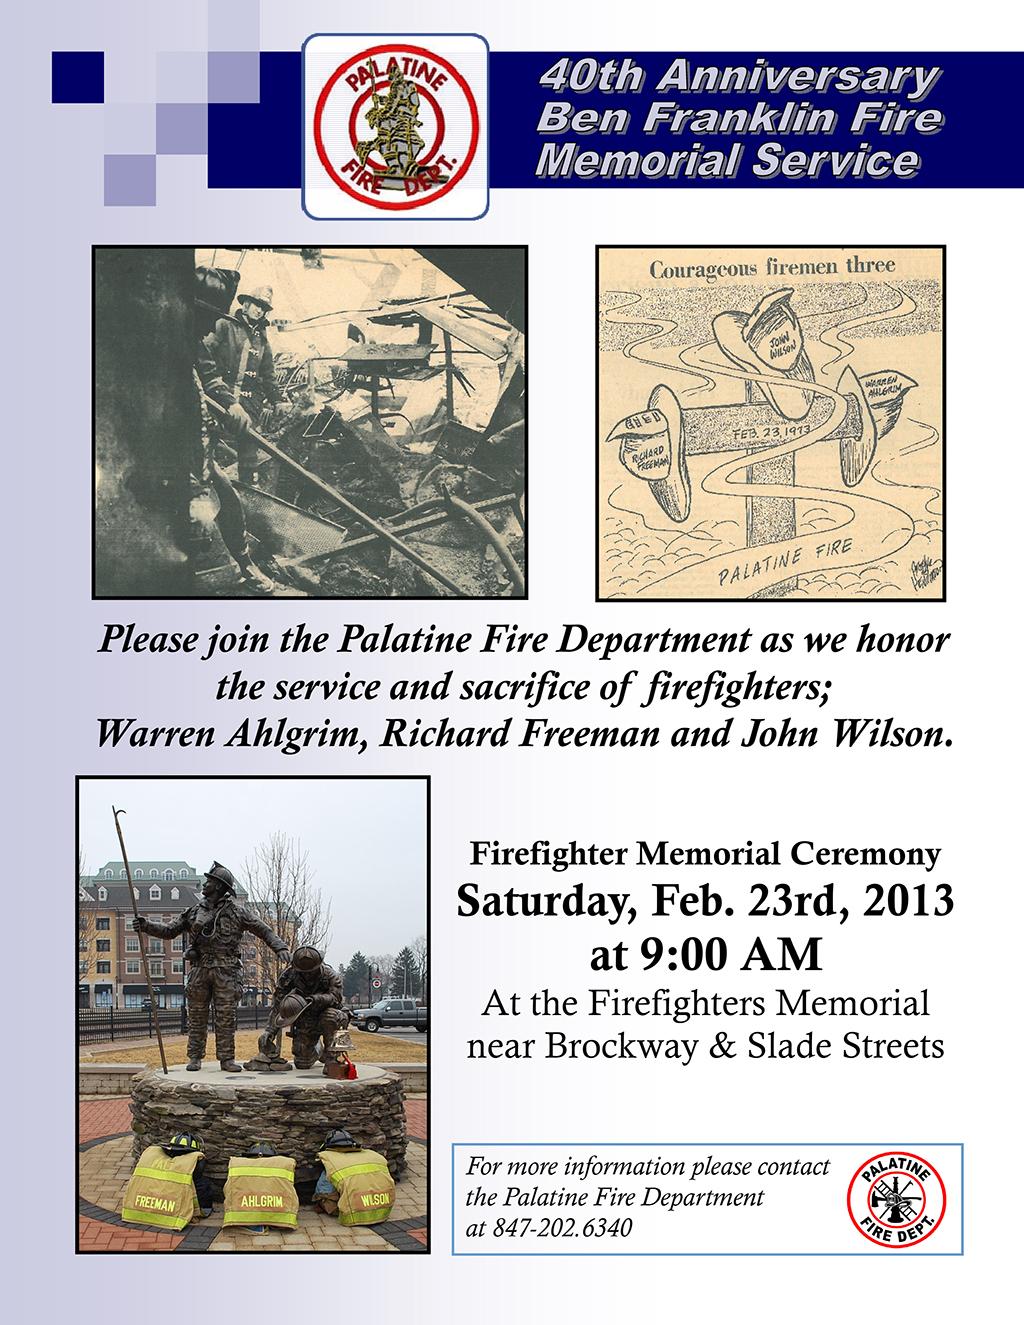 Palatine Firefighter Memorial Service